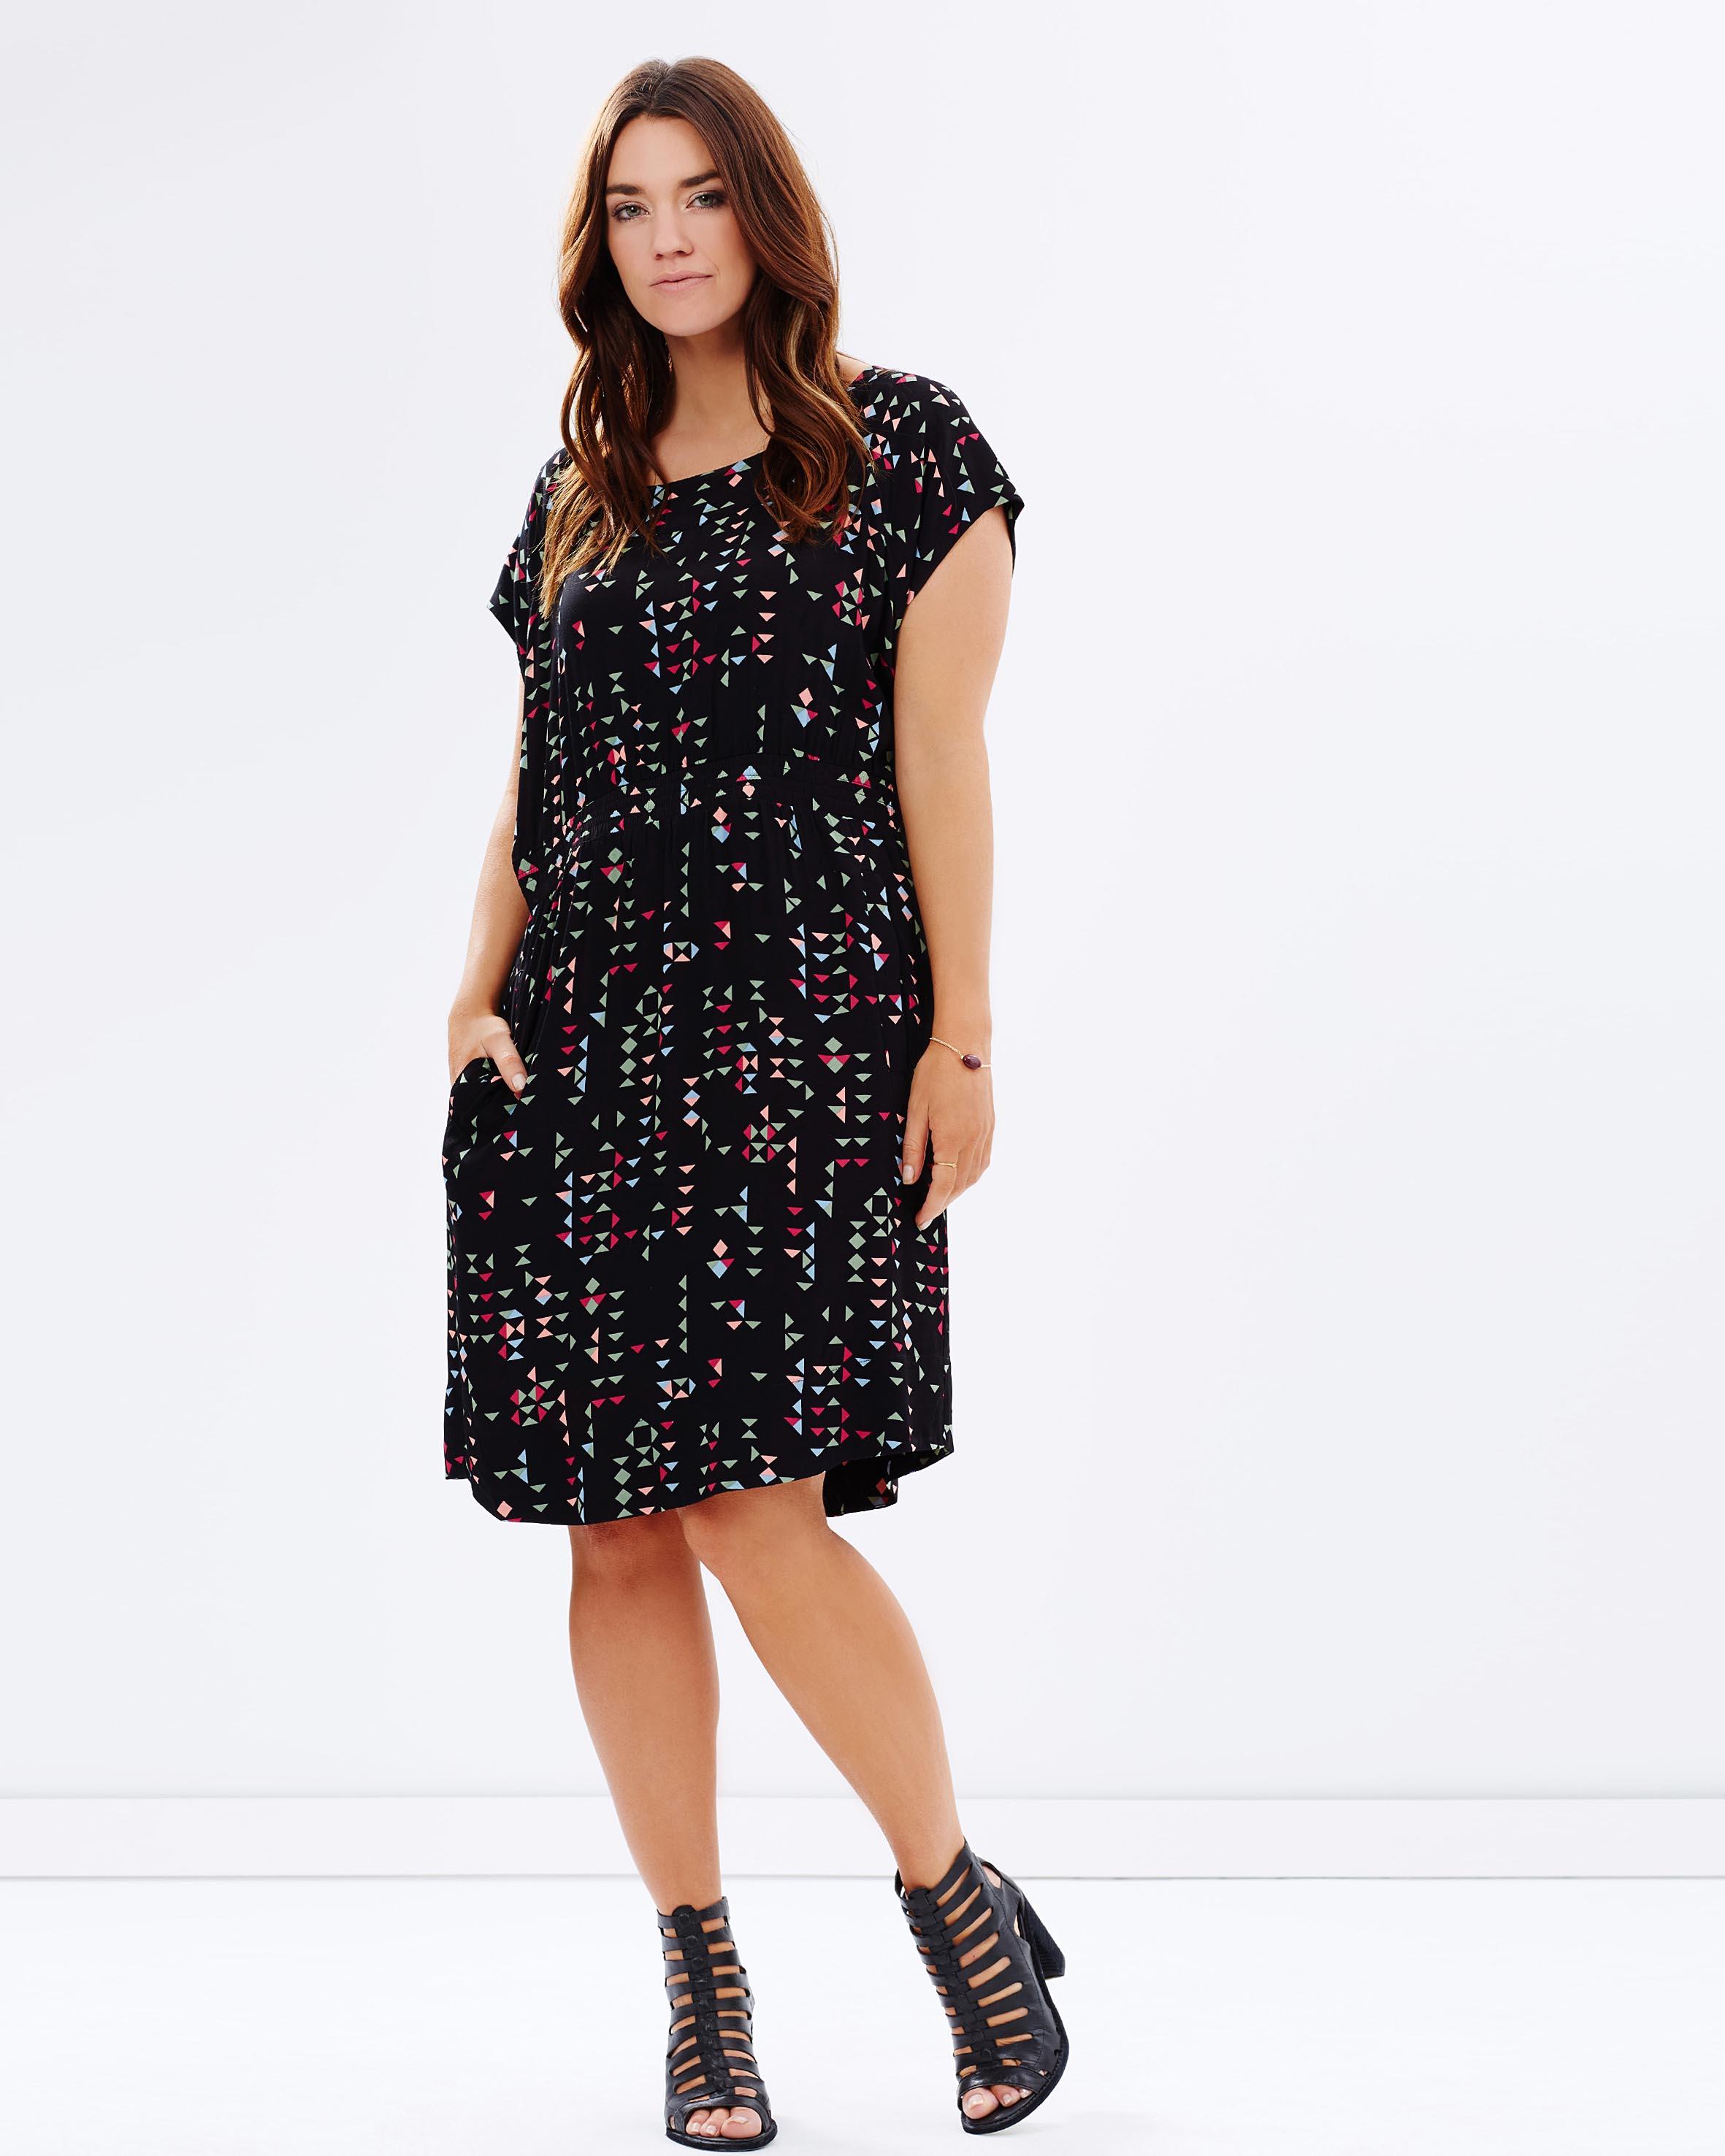 Fashion clothes plus size women Online clothing stores